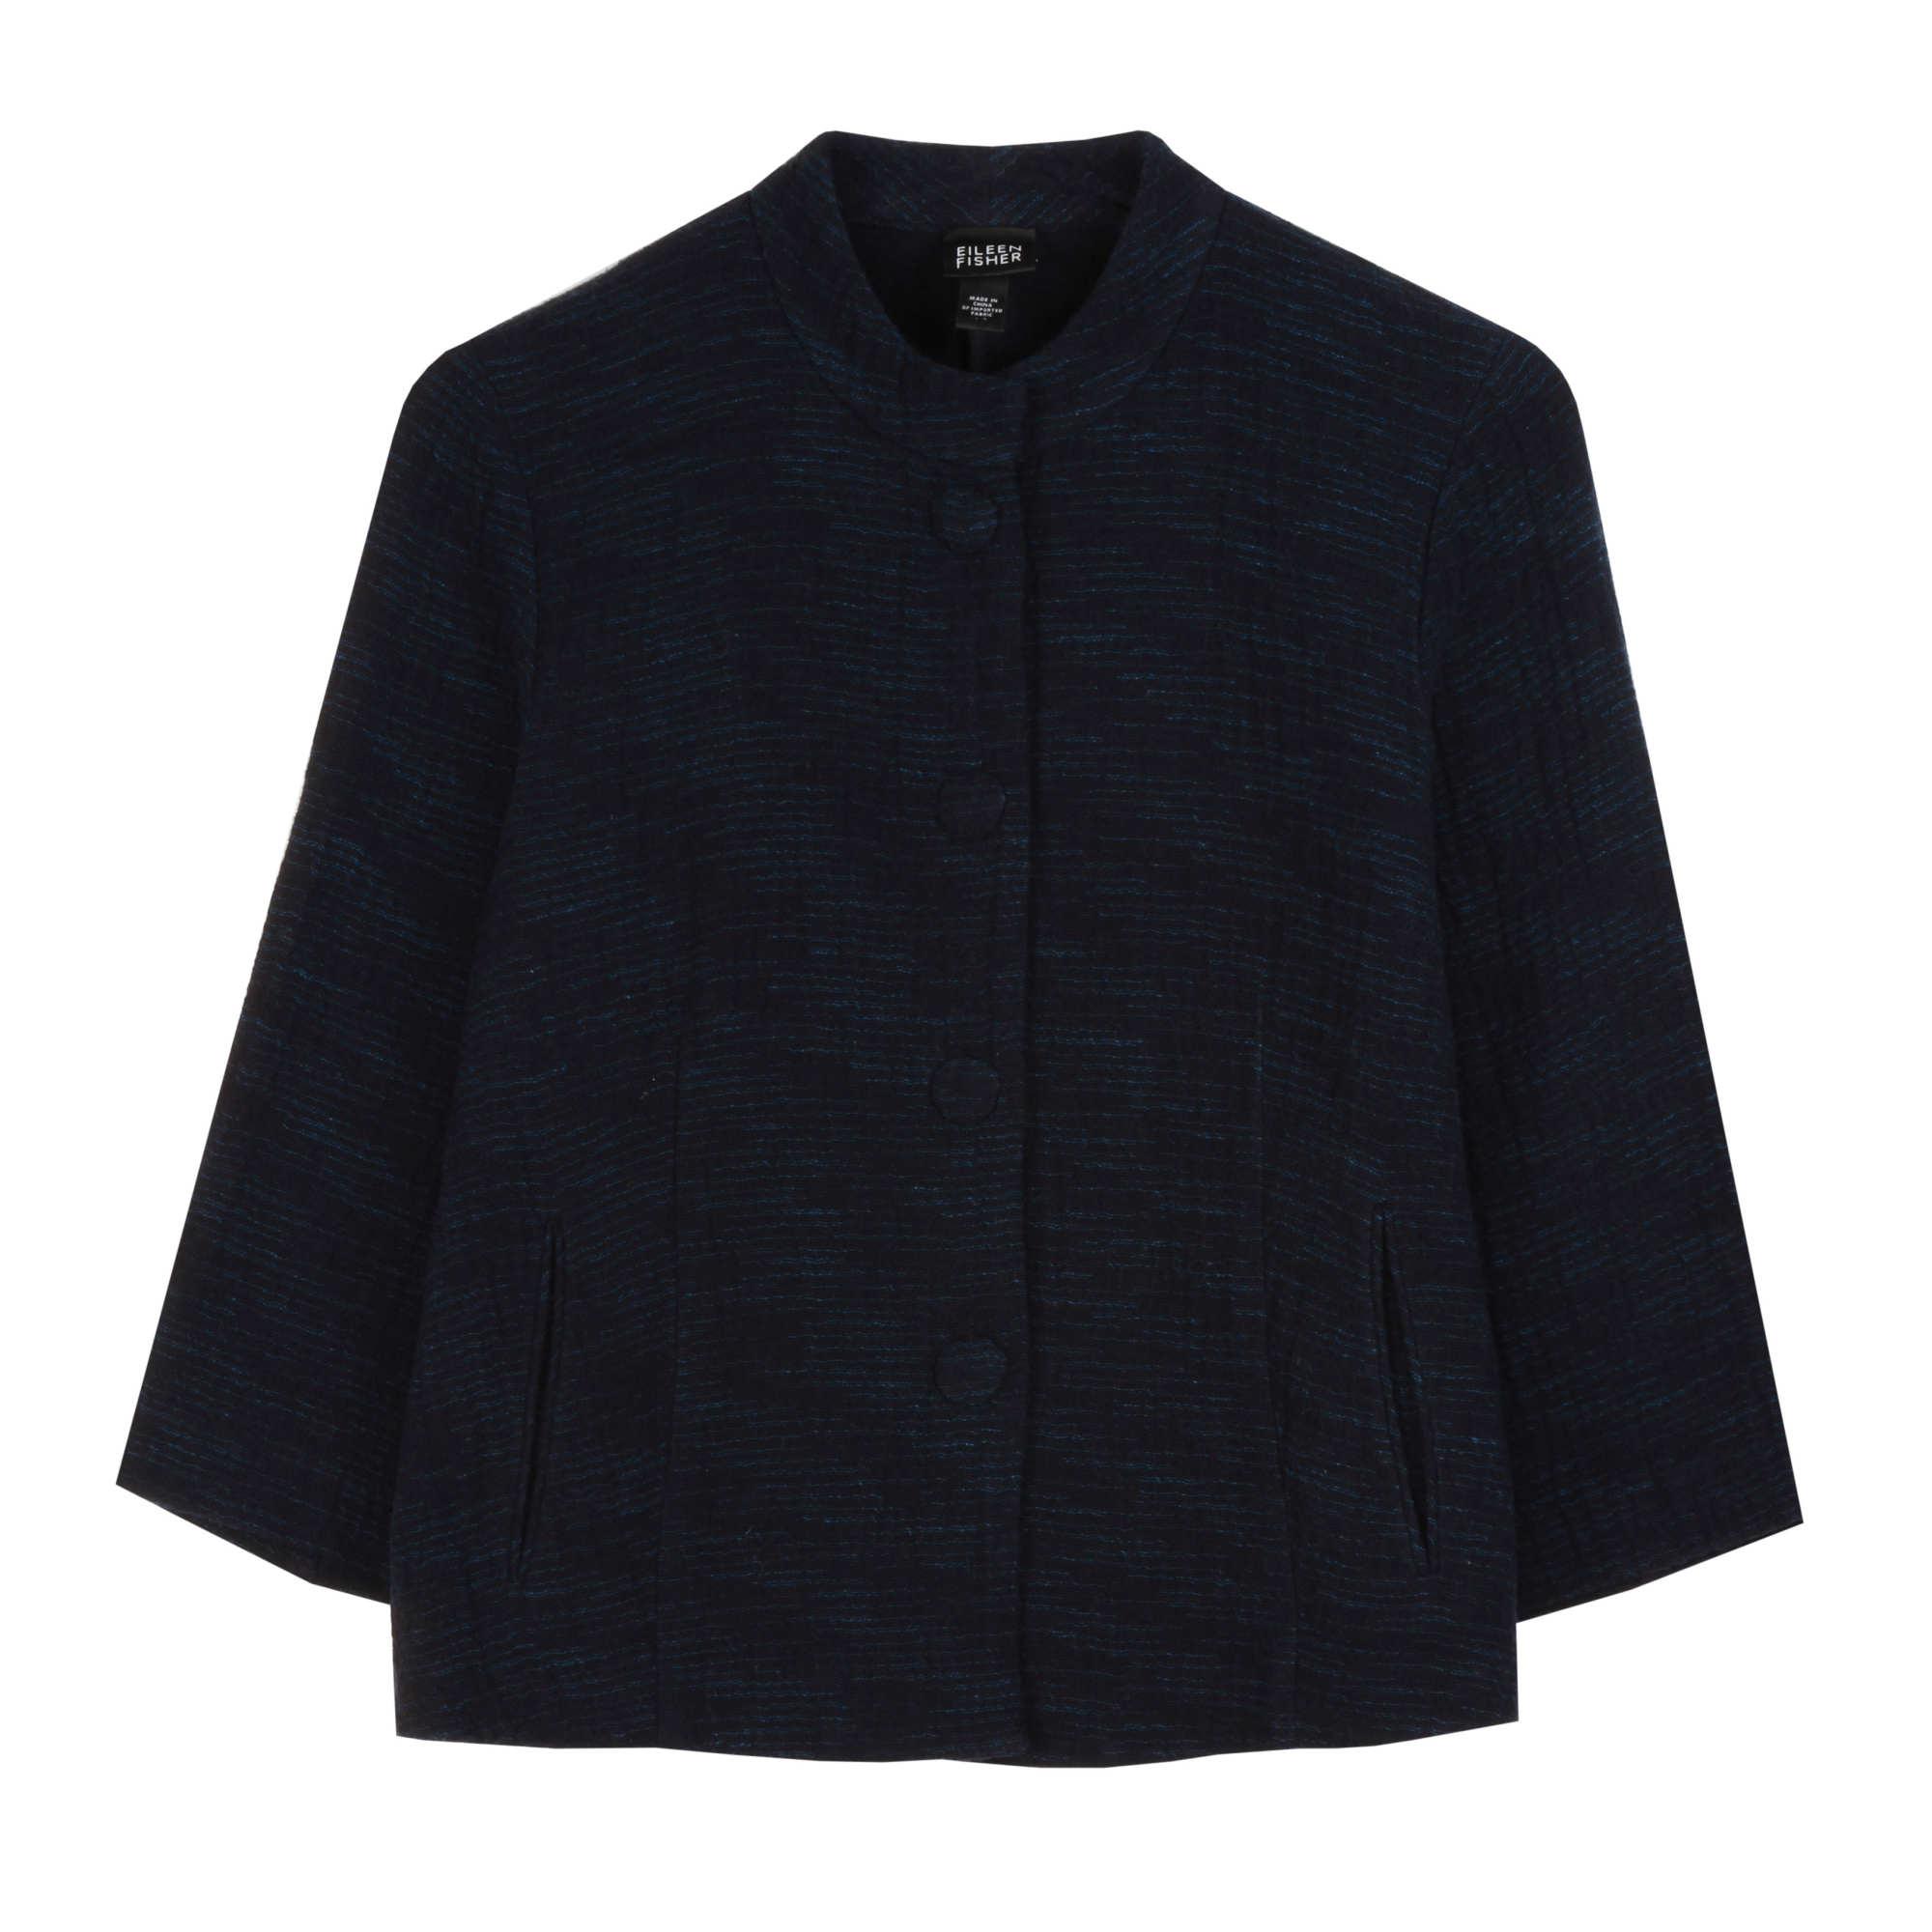 Artisanal Cotton Doubleweave Jacket